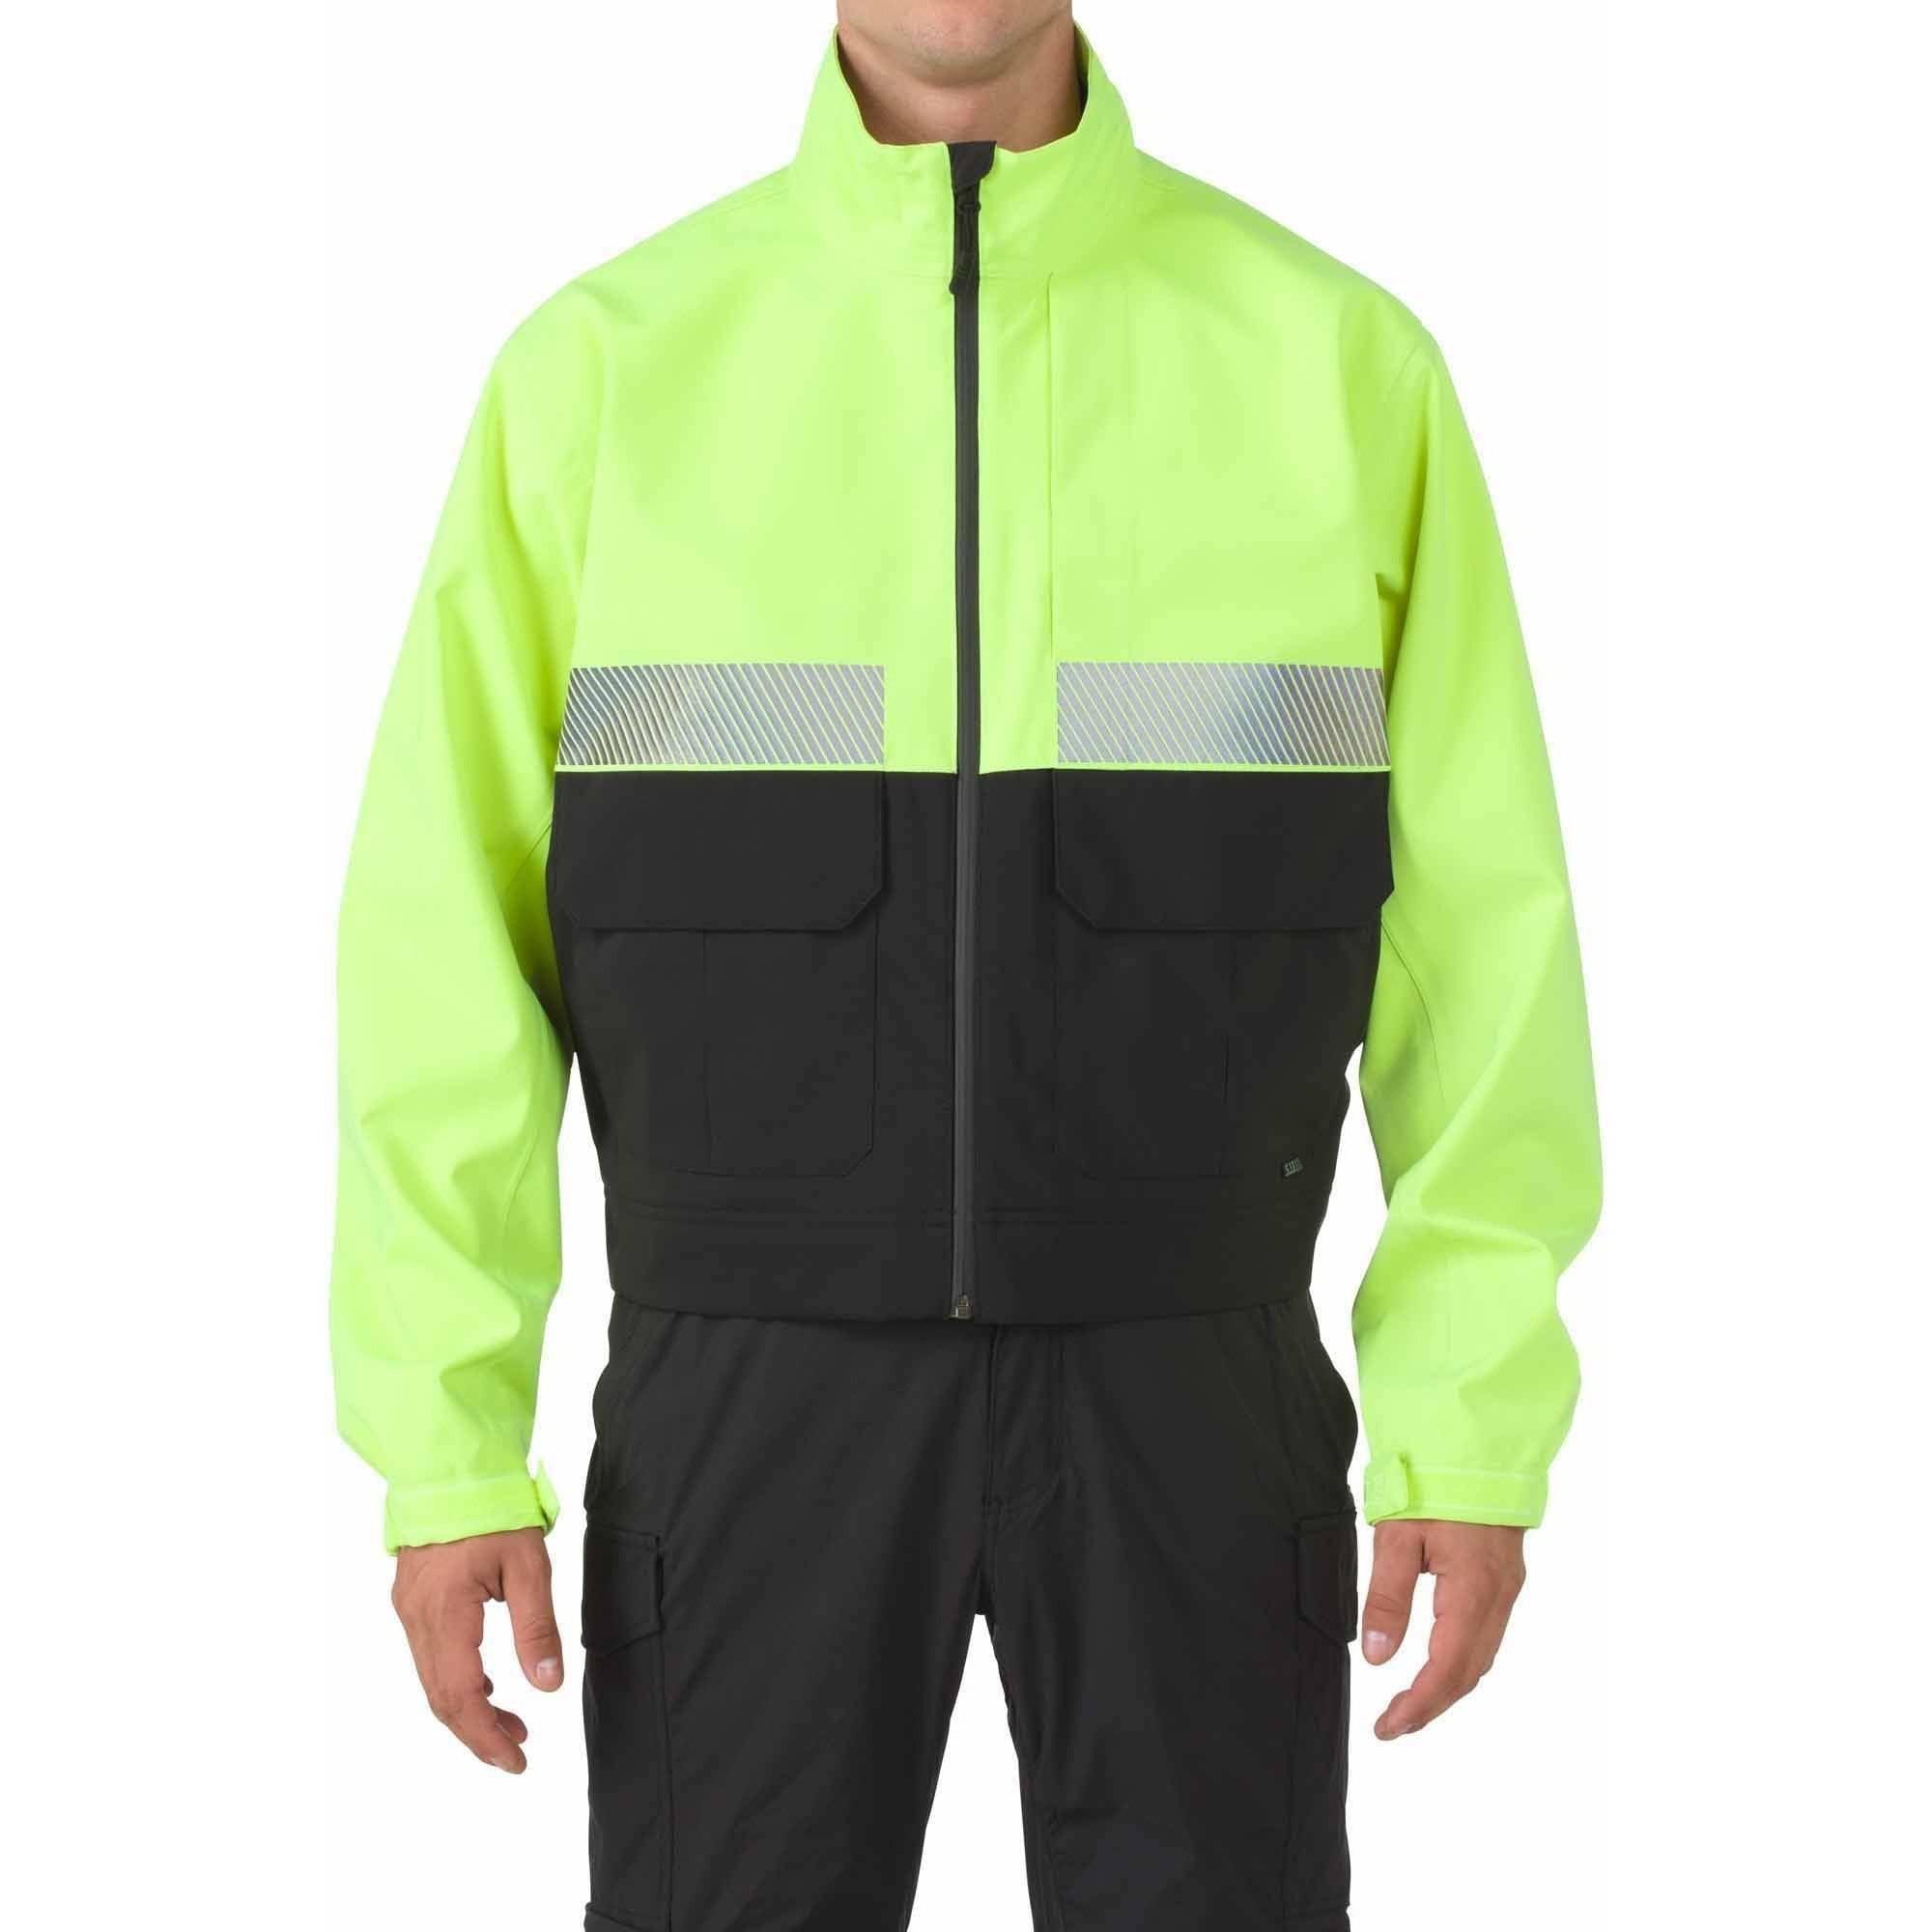 5.11 Tactical Bike Patrol Jacket, High-Vis Yellow